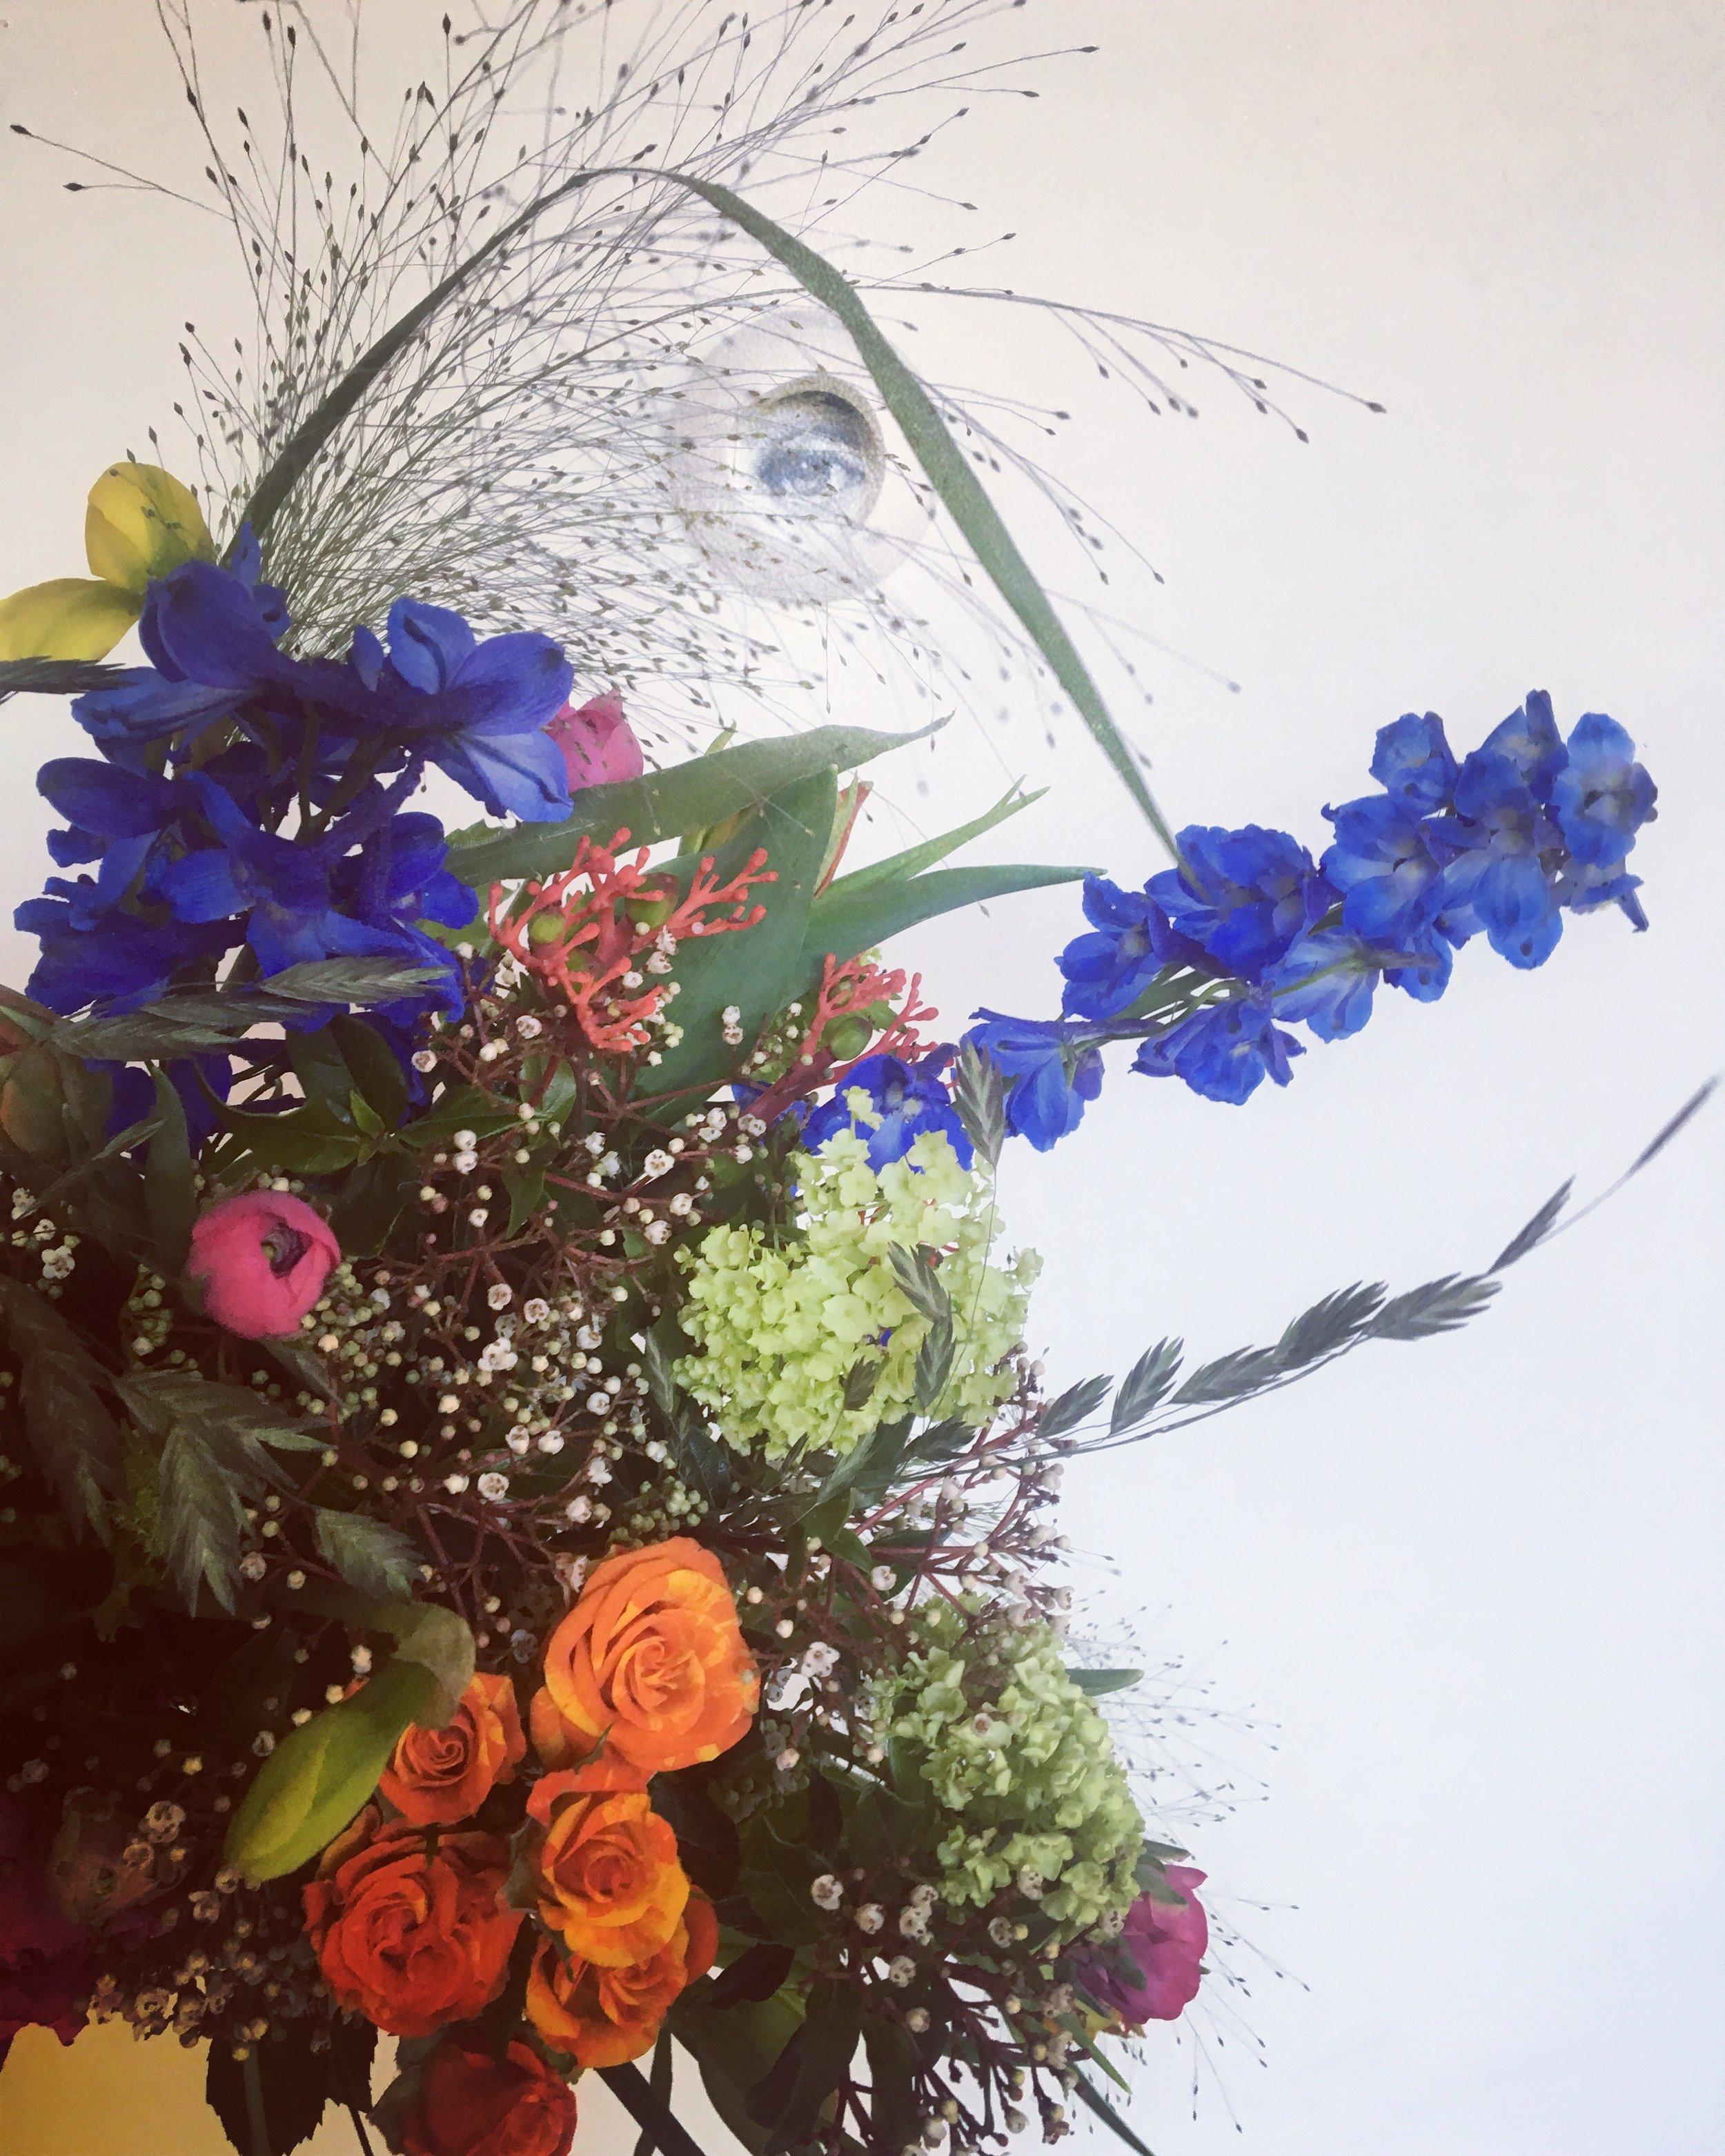 Delphinium, Renoncules, Narcisses, Jatropha, Roses, Viburnum (…) Bouquet & photo by Horty Poetry - February 2019